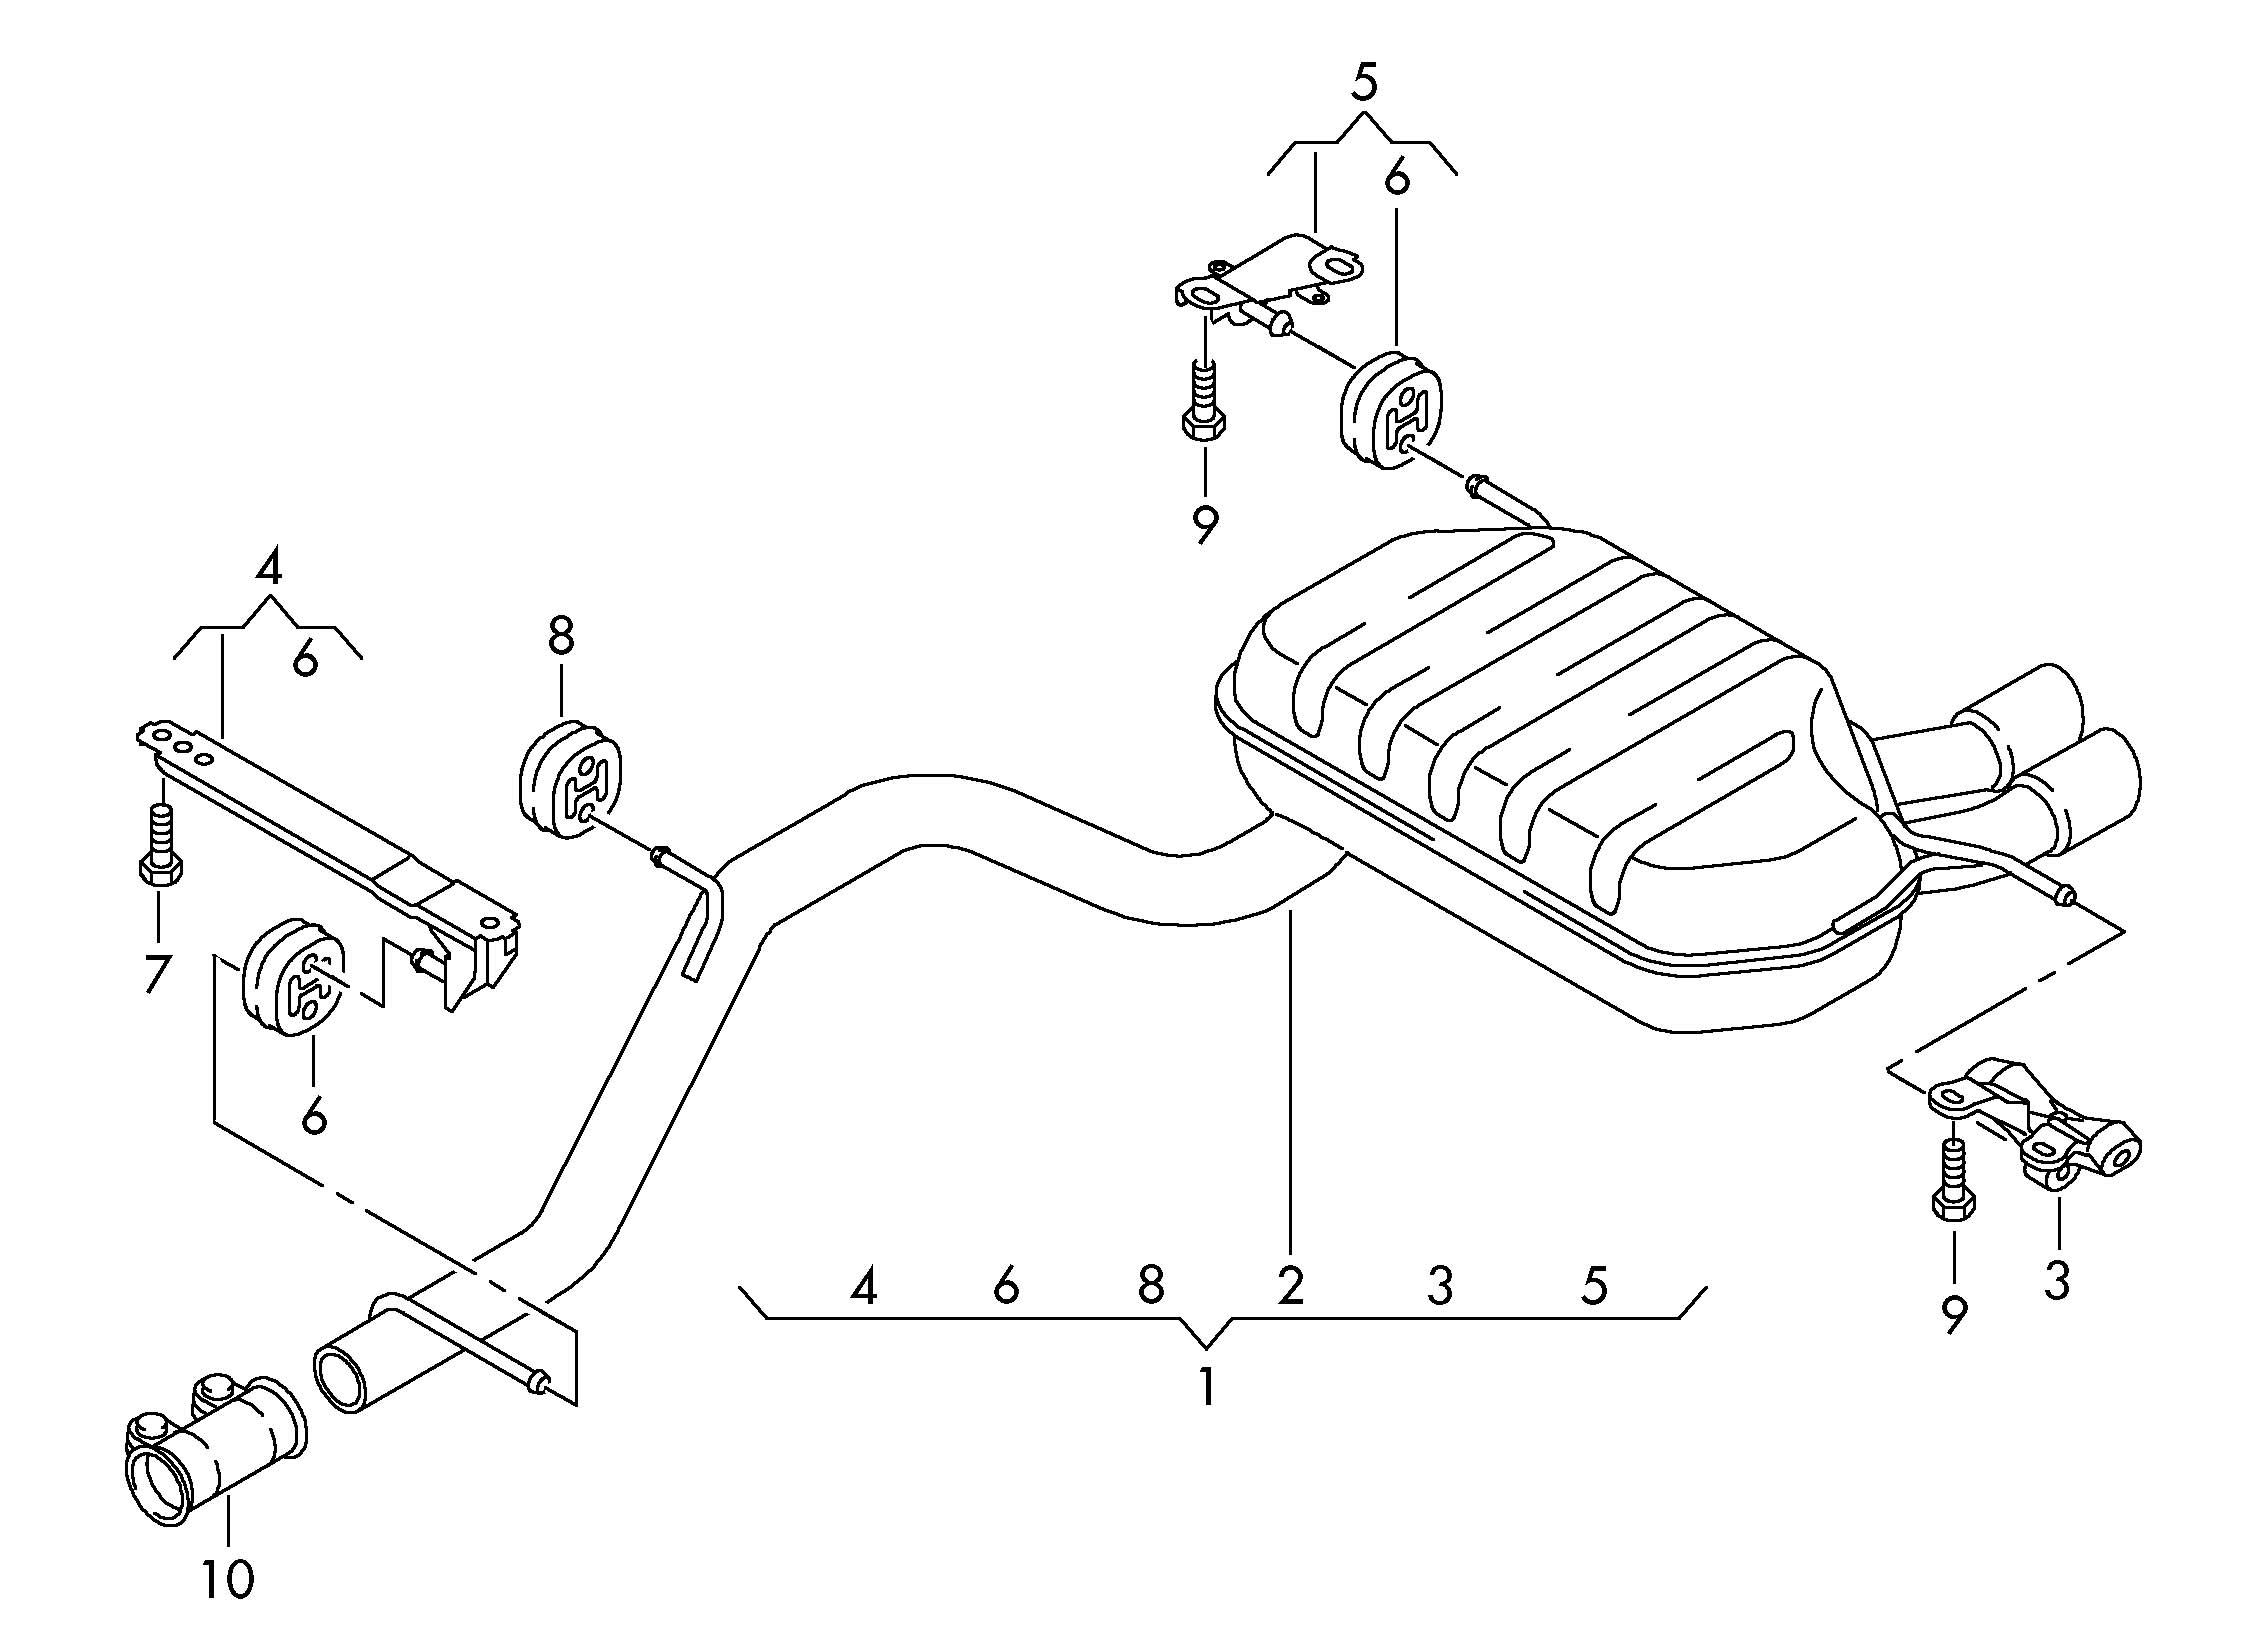 Volkswagen Golf Intermediate Pipe With Muffler 2 0ltr